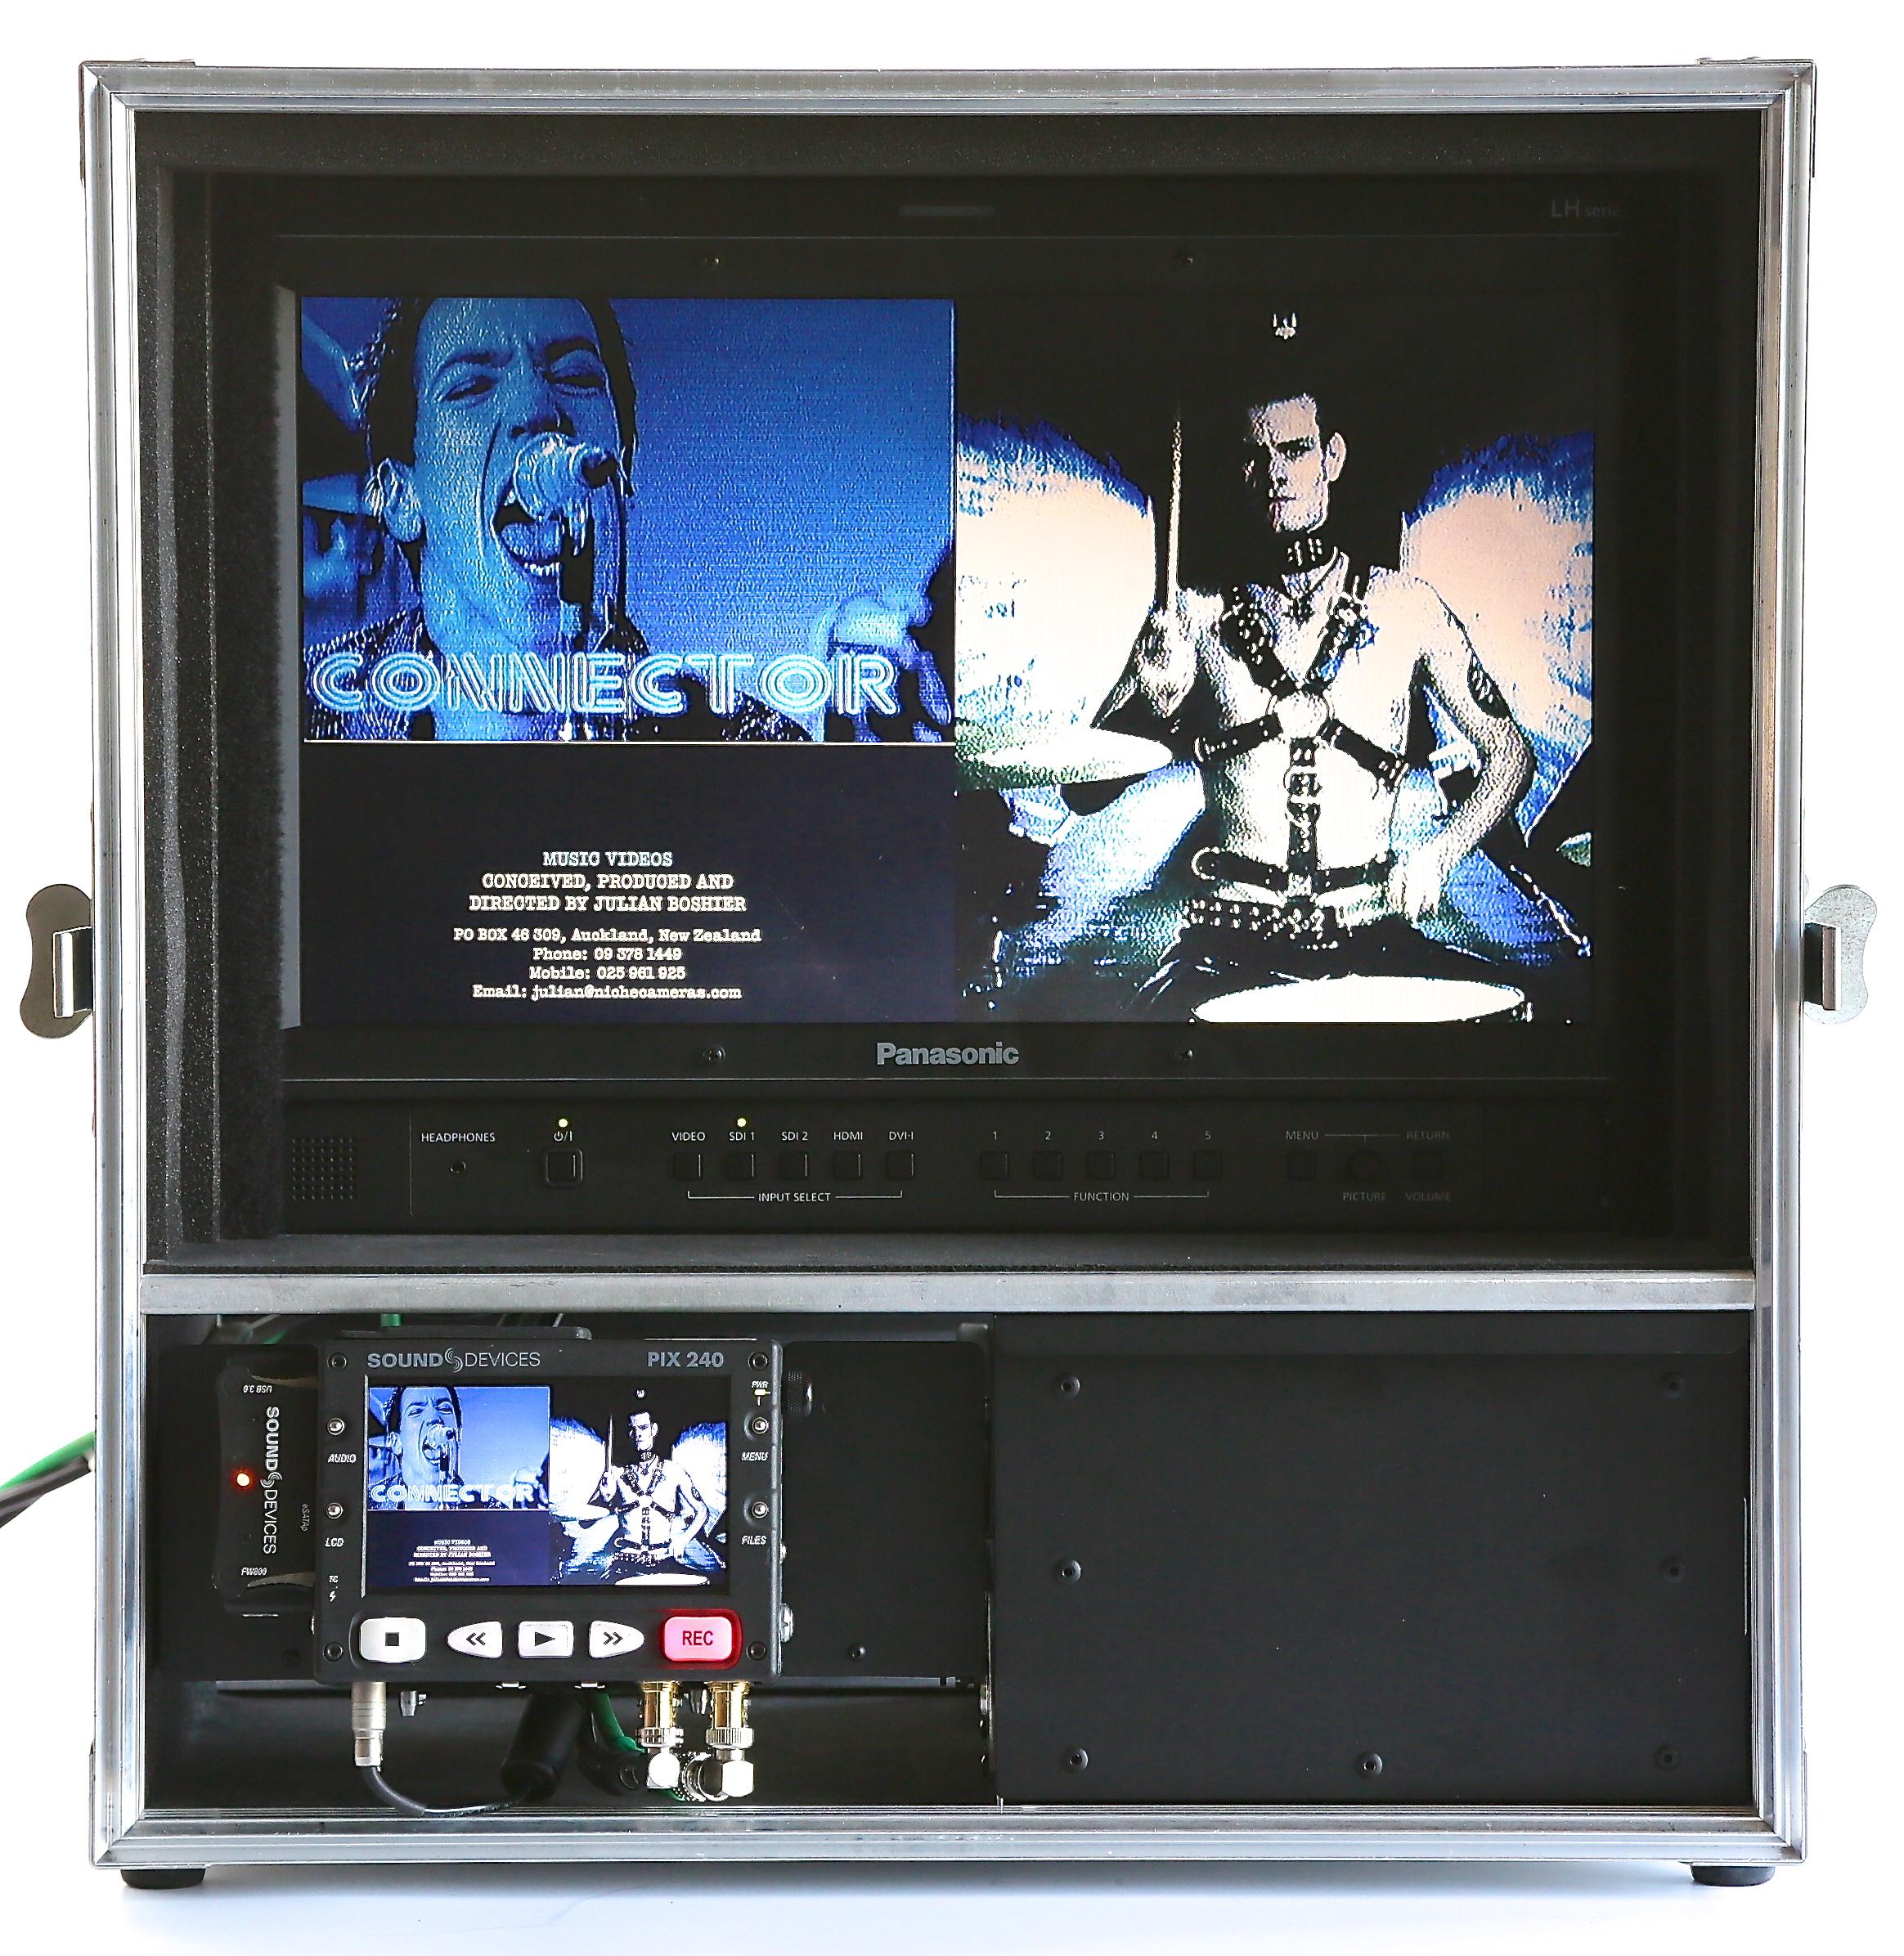 PIX240i, Panasonic LH1850 18.5